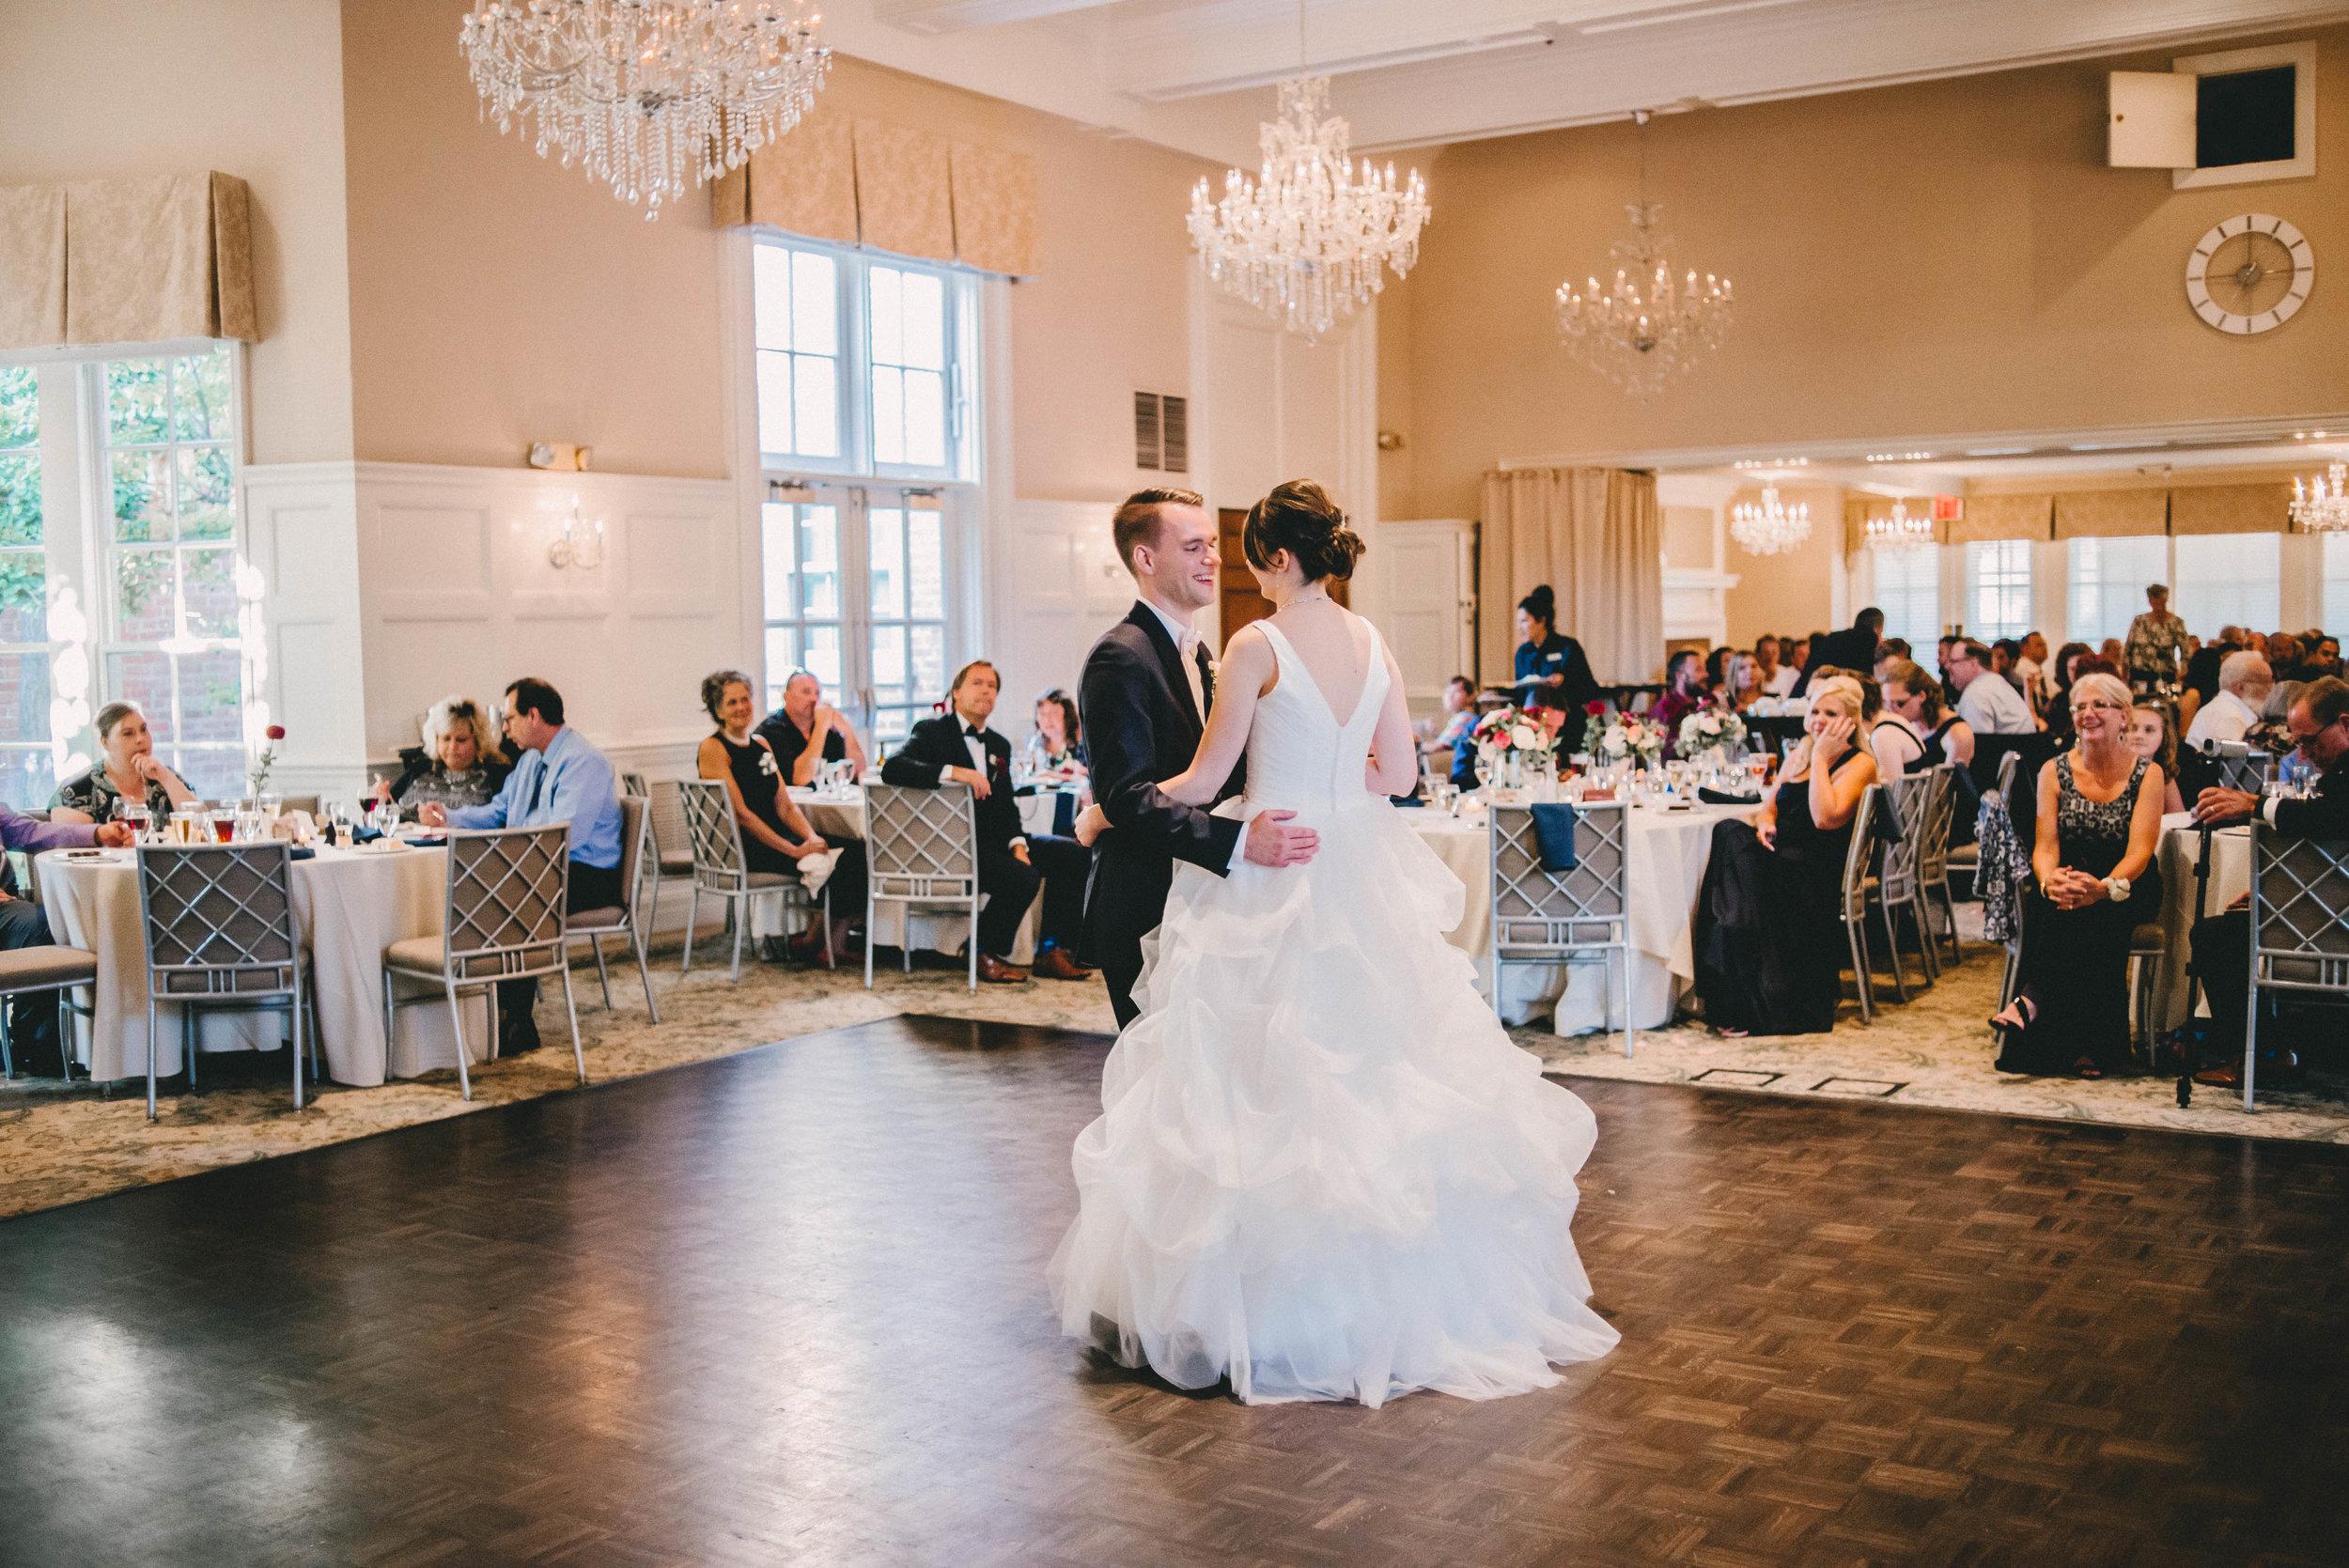 Kara and Mike Wedding-20160904-19-06-29.jpg